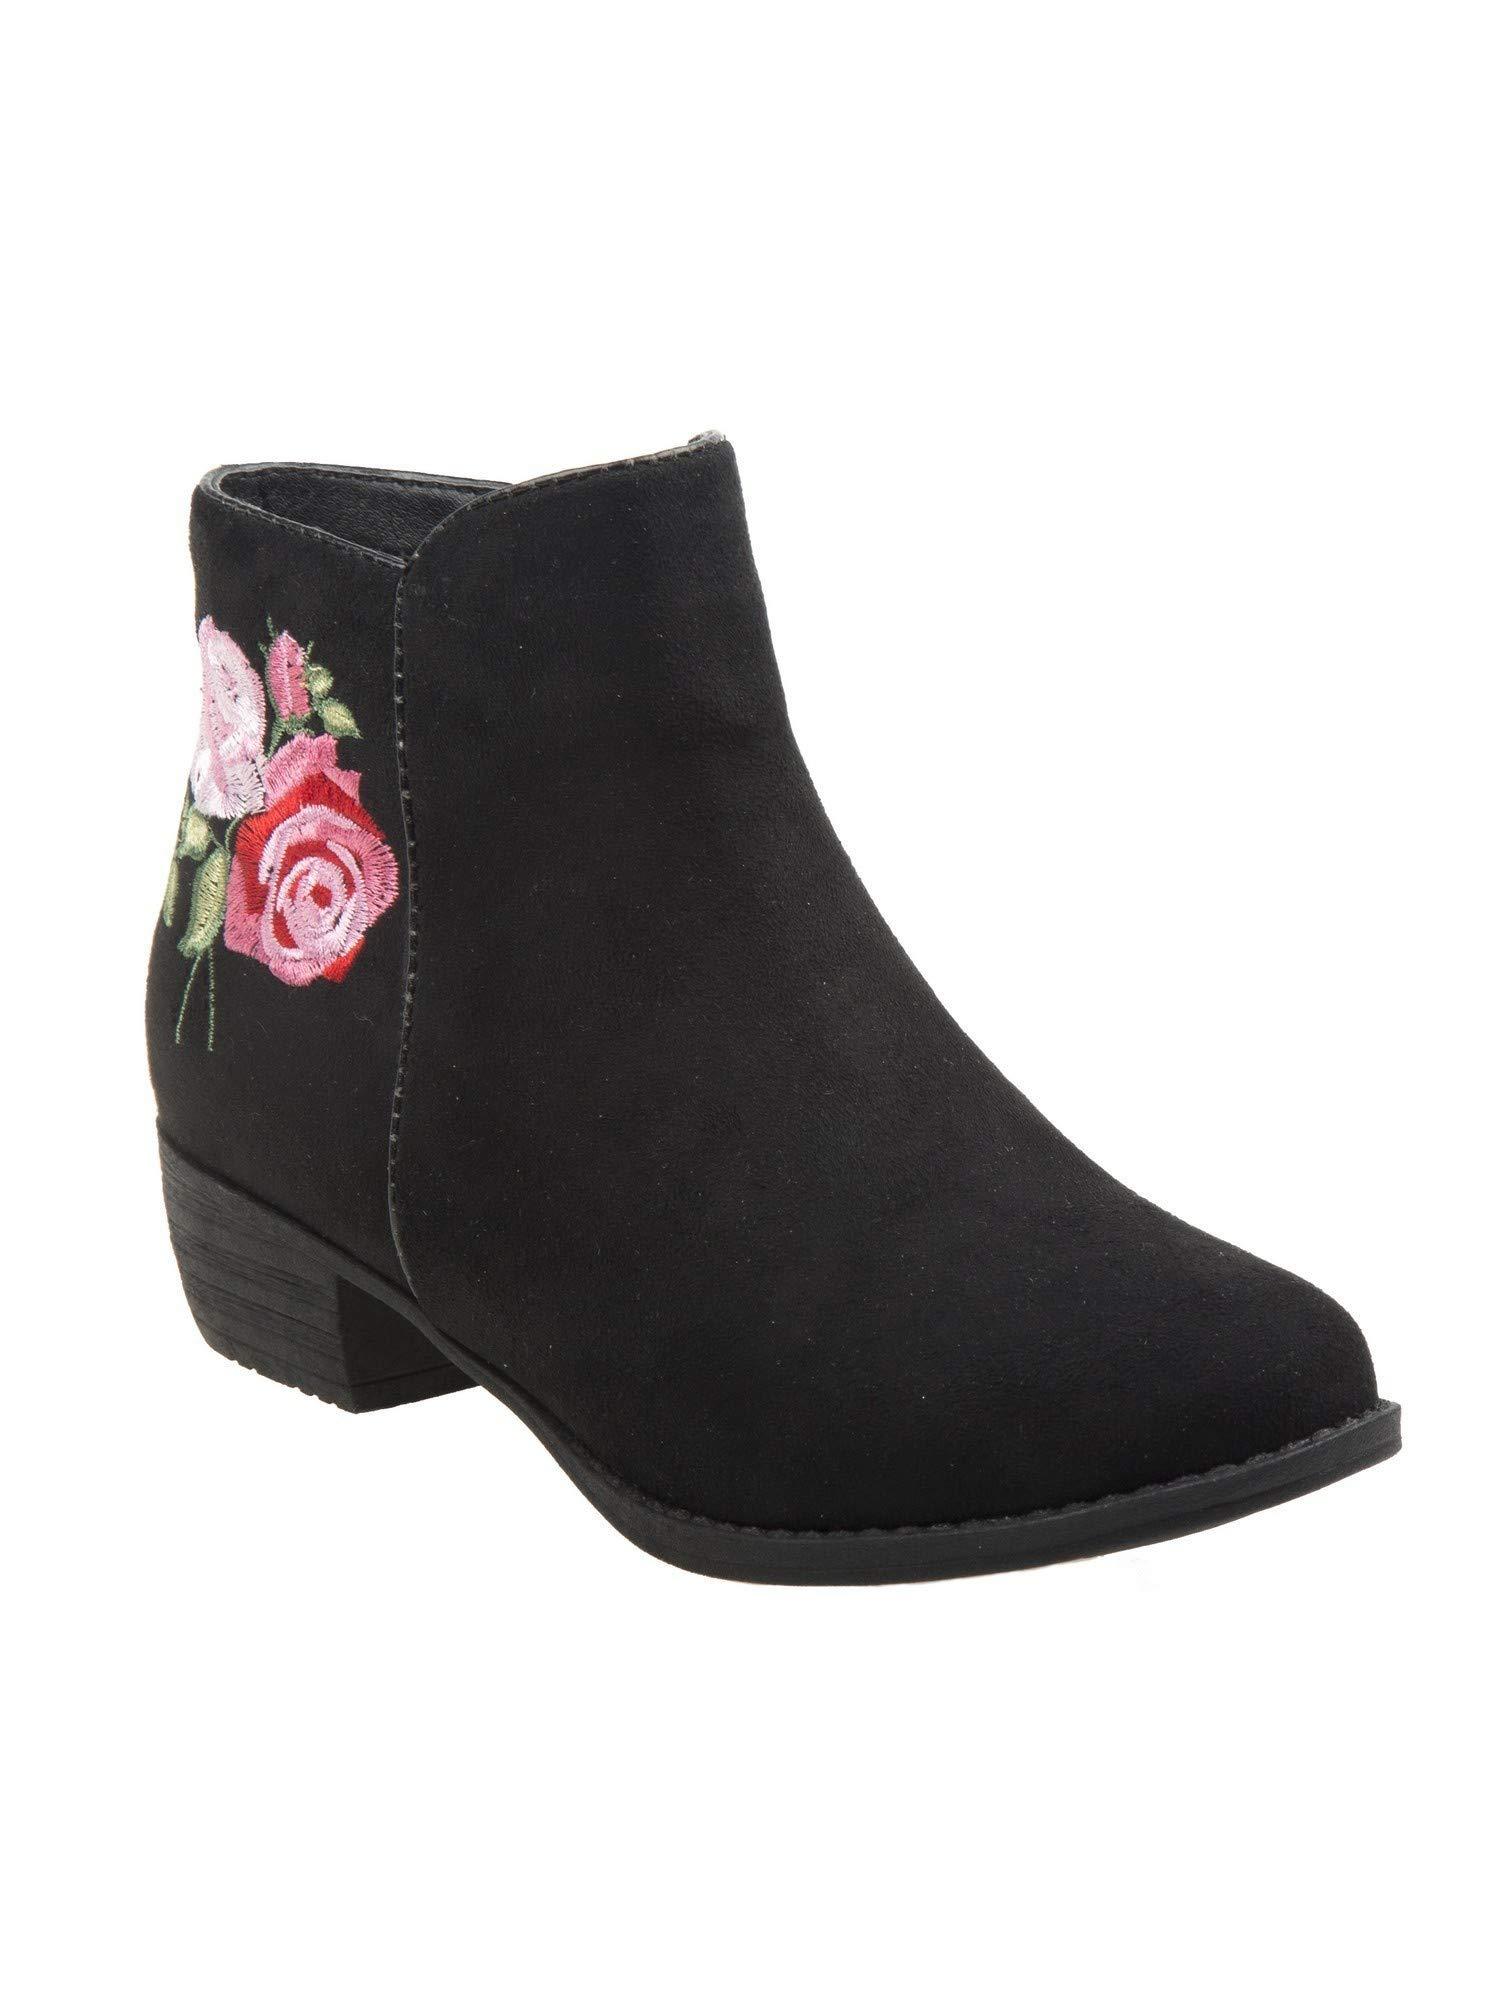 Nanette Lepore Girls Black Pink Flower Applique Ankle Booties 2 Kids